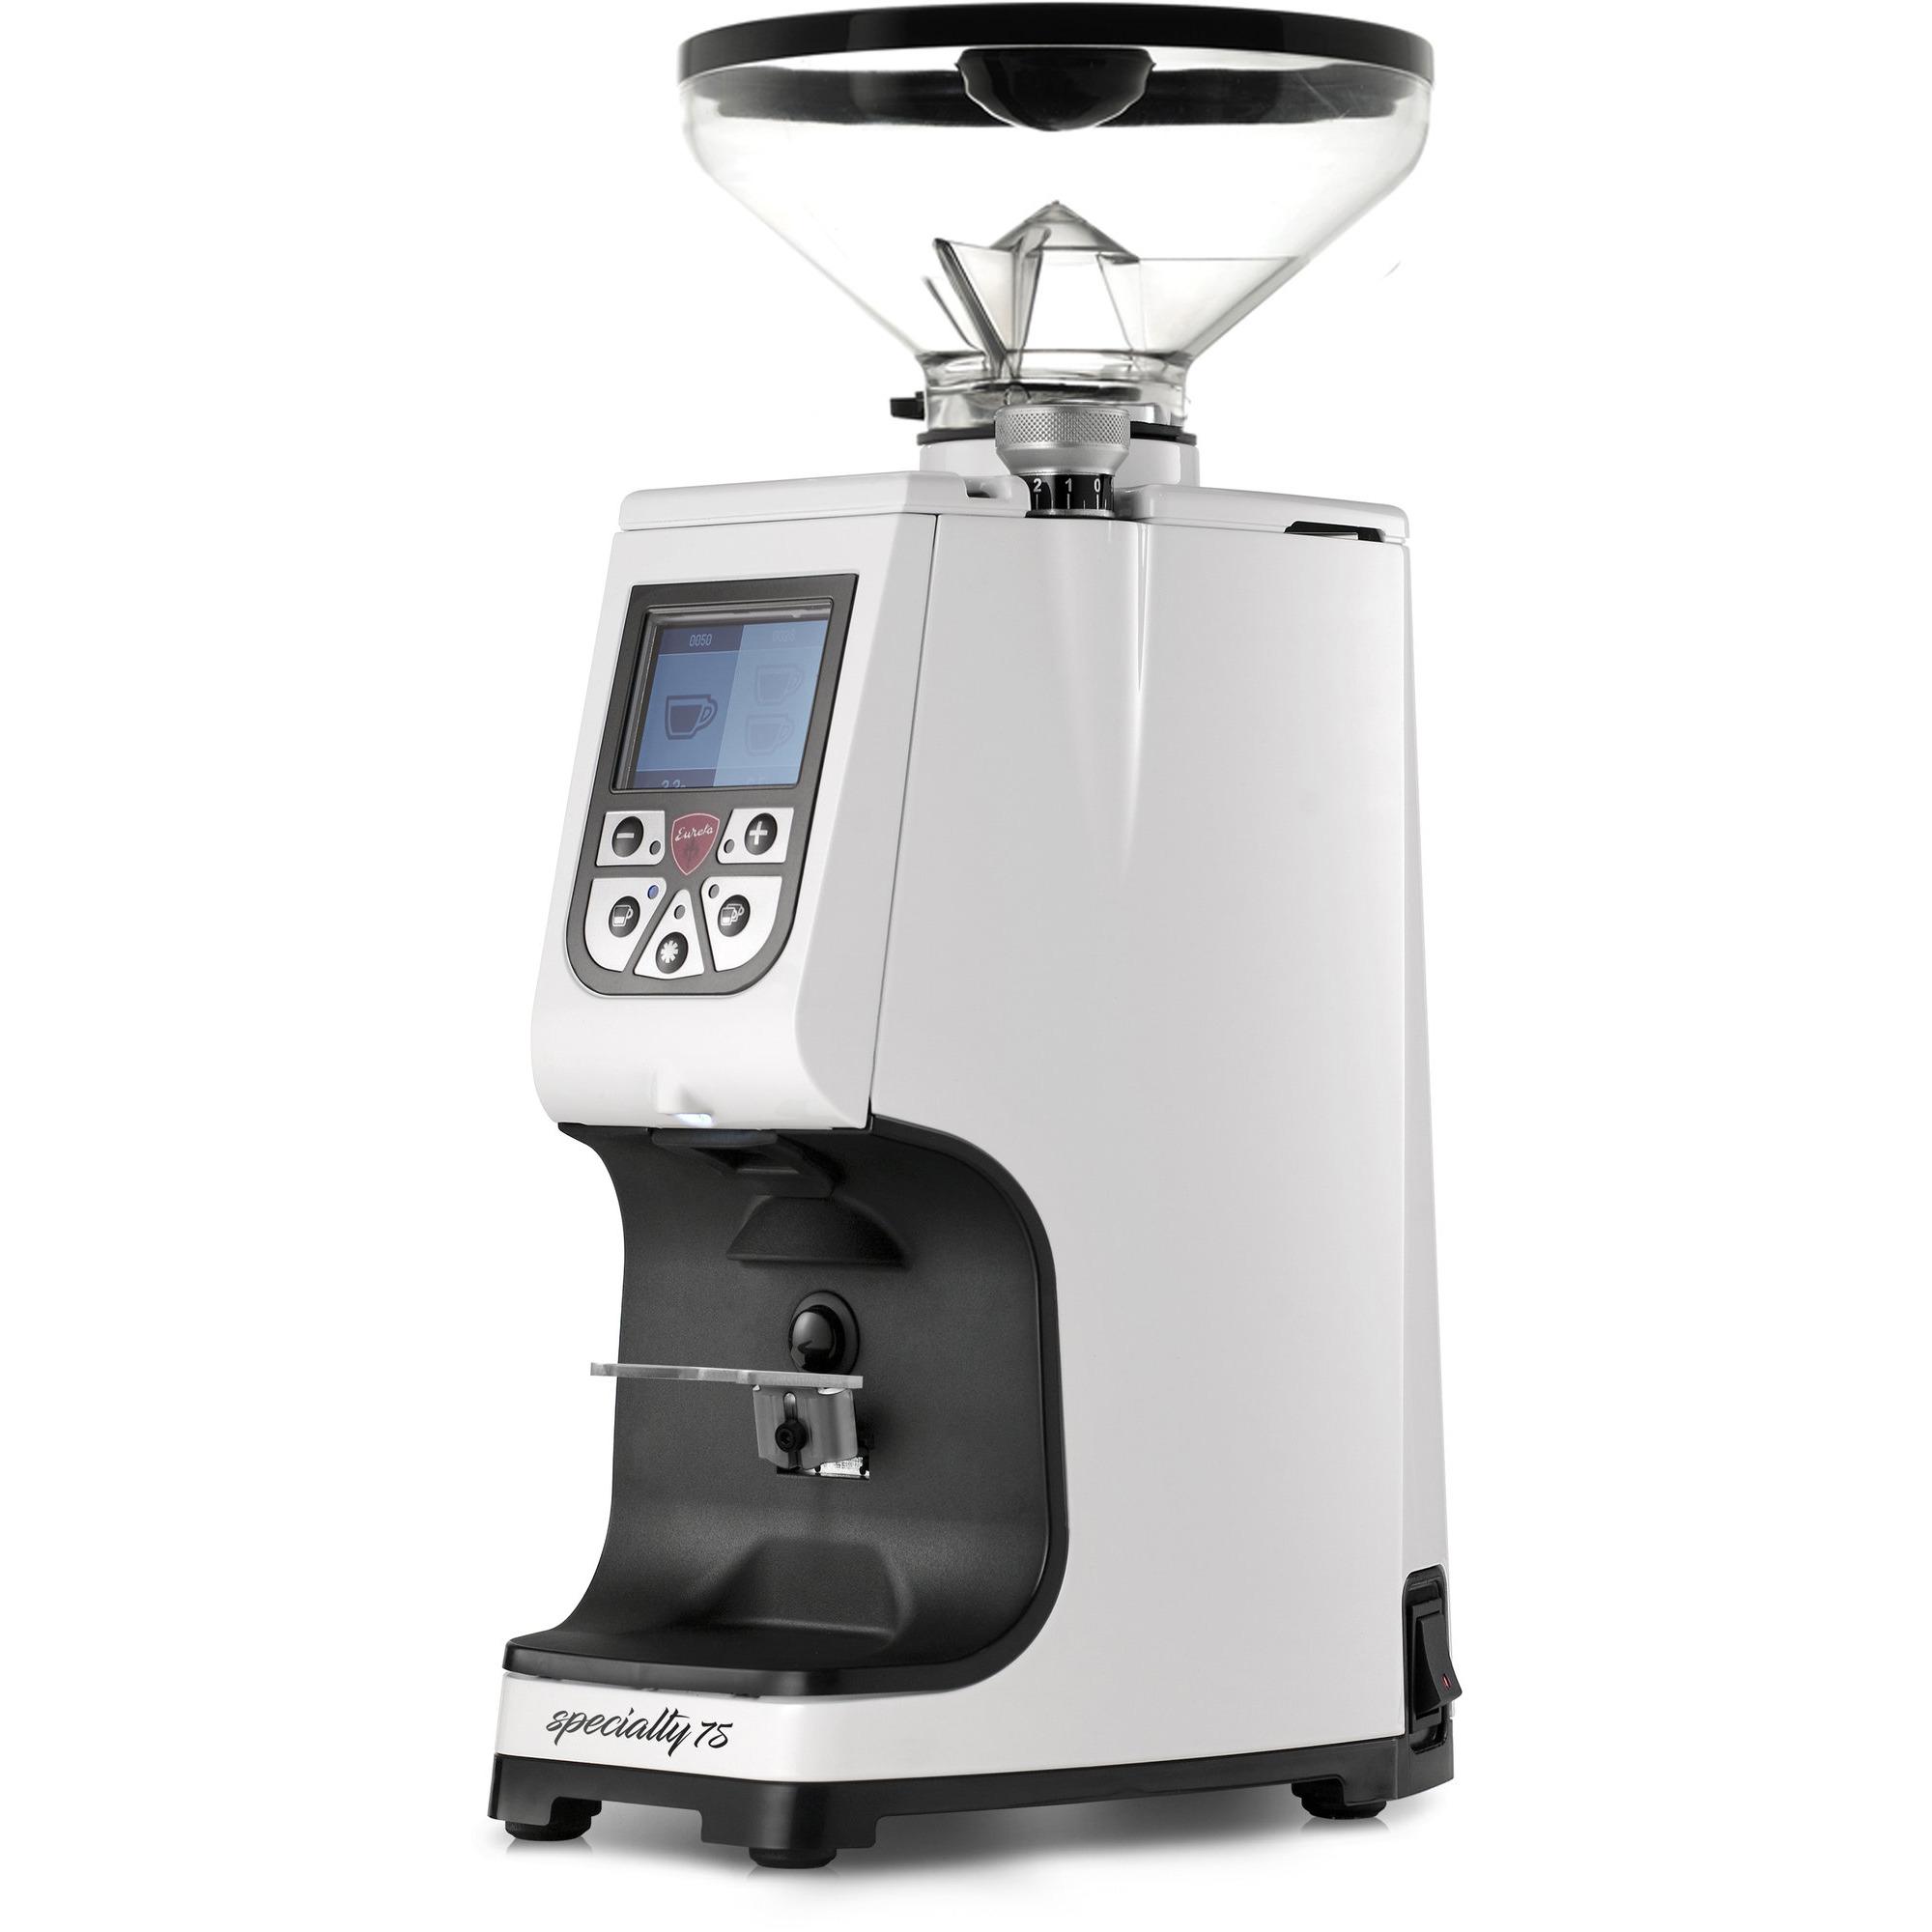 Eureka ATOM Specialty 75 elektrisk kaffekvarn Vit